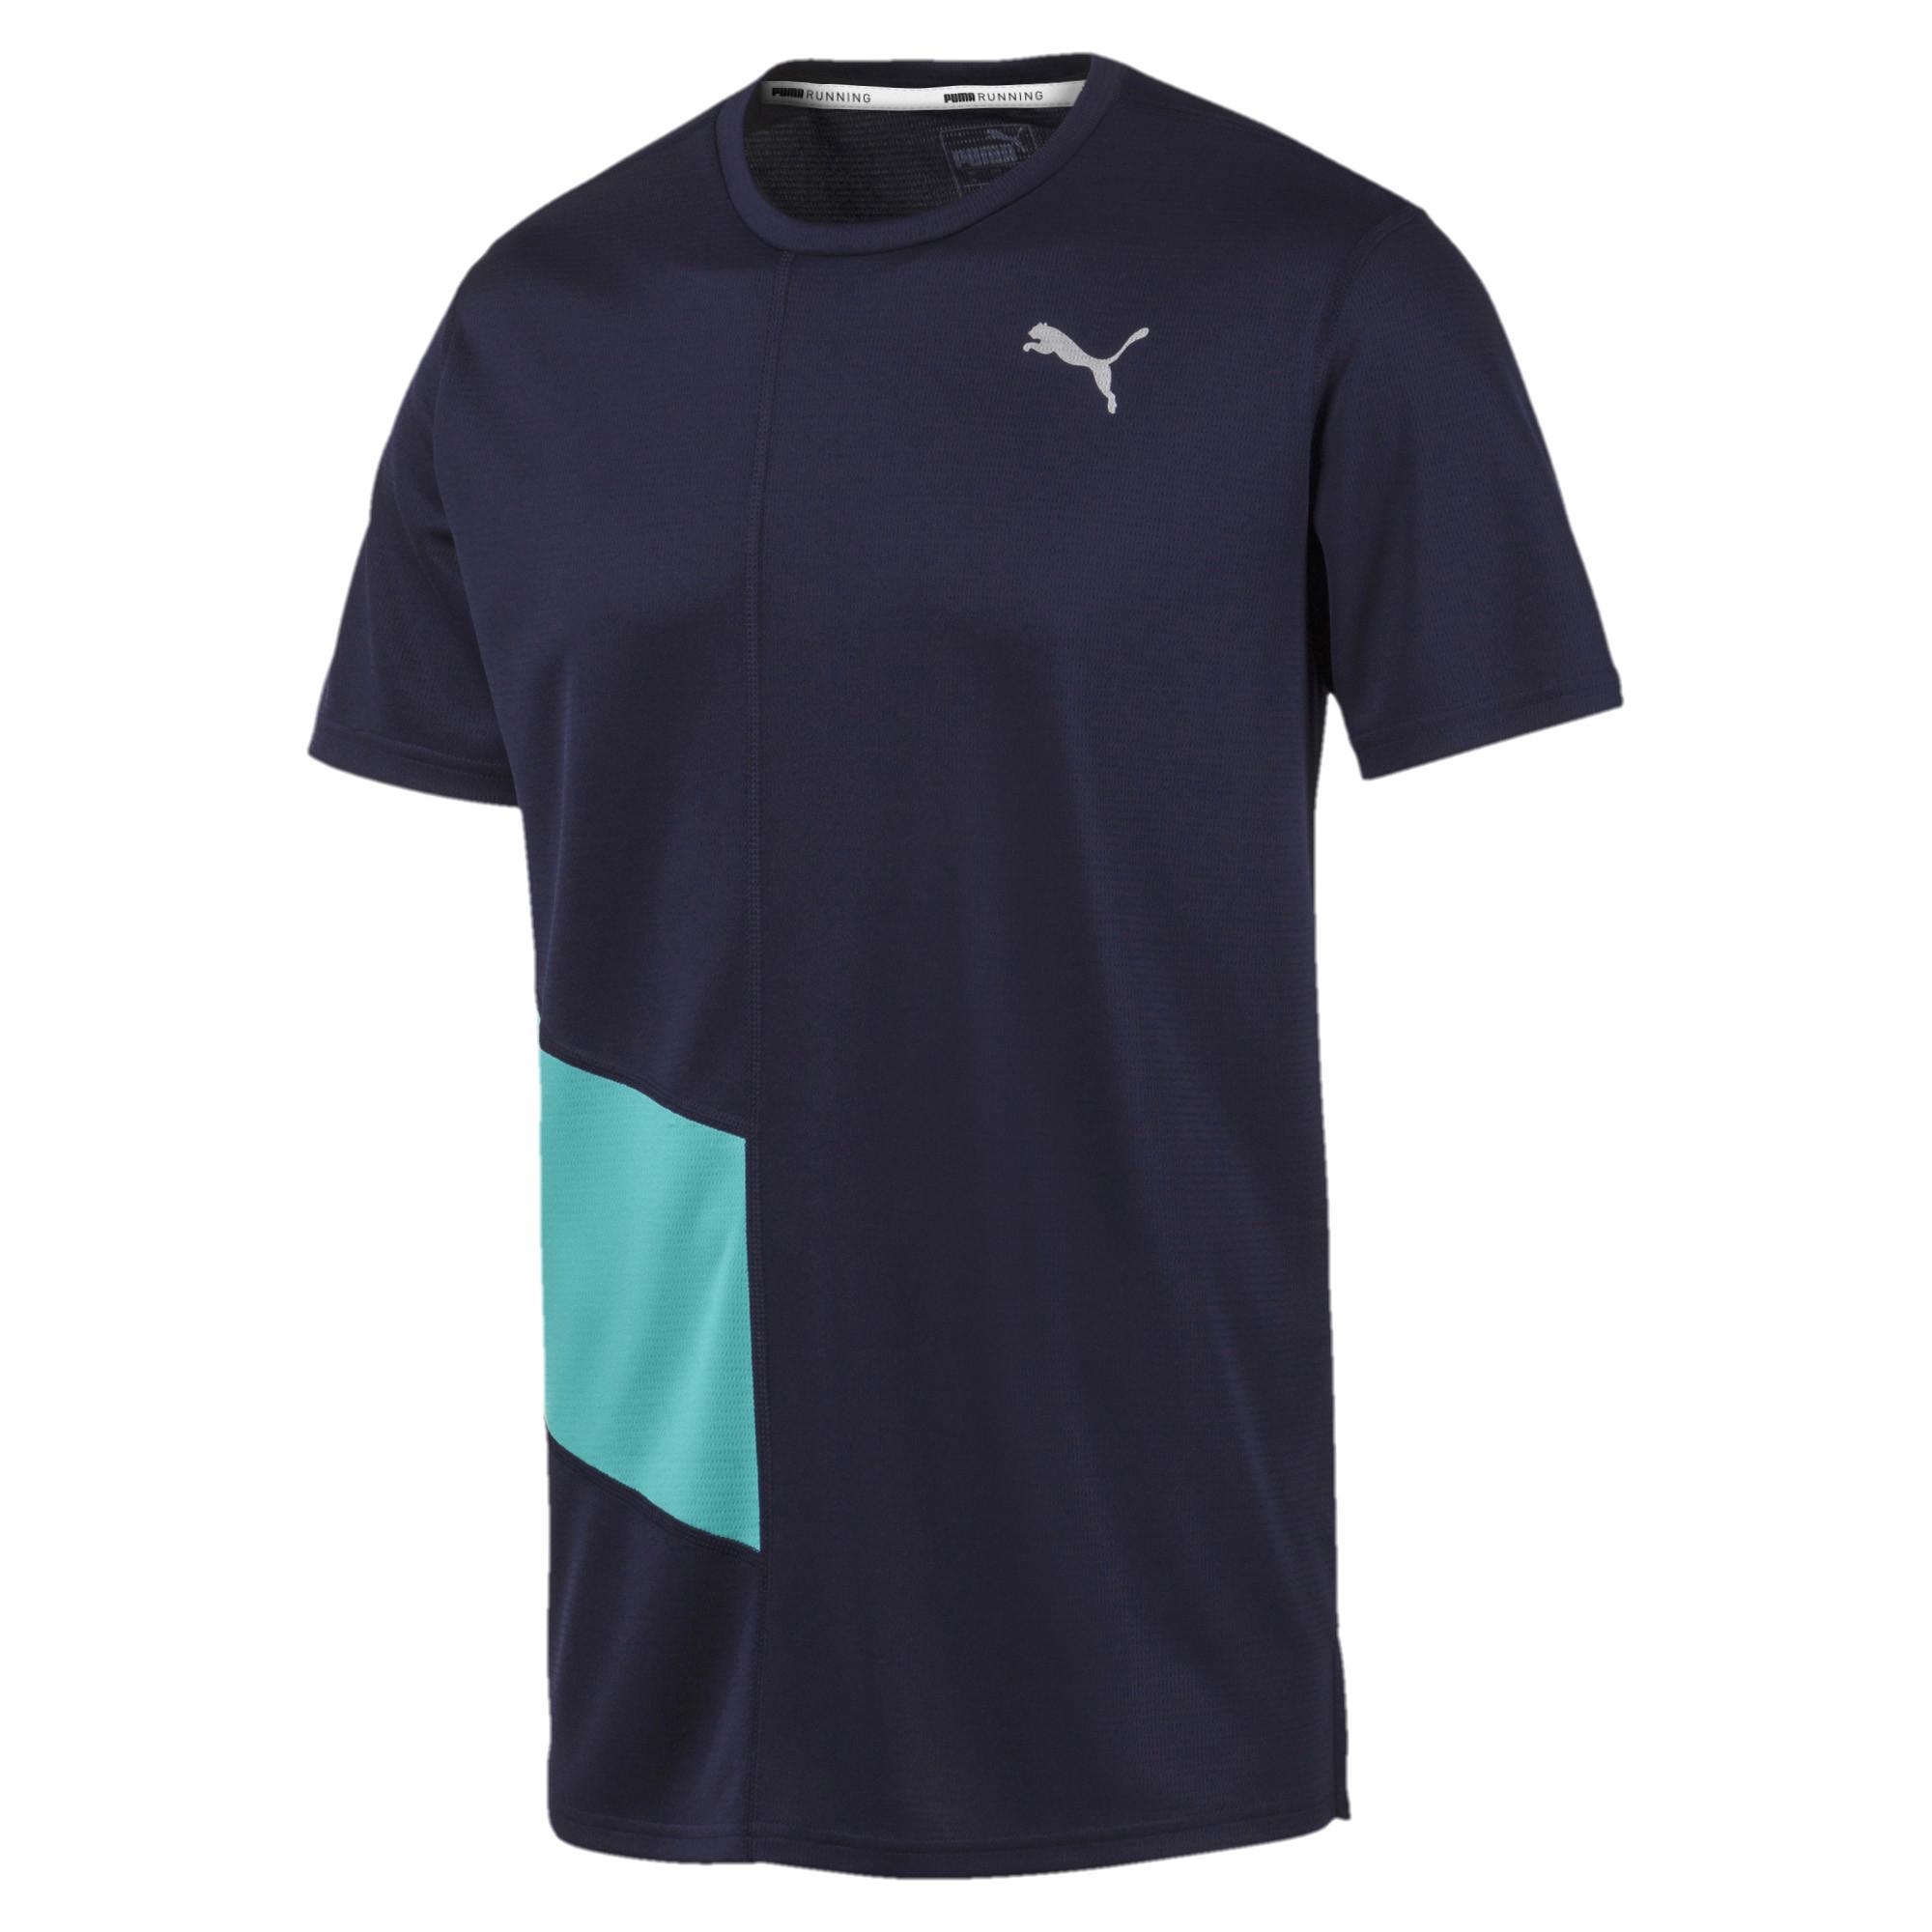 Puma T-shirt Ignite